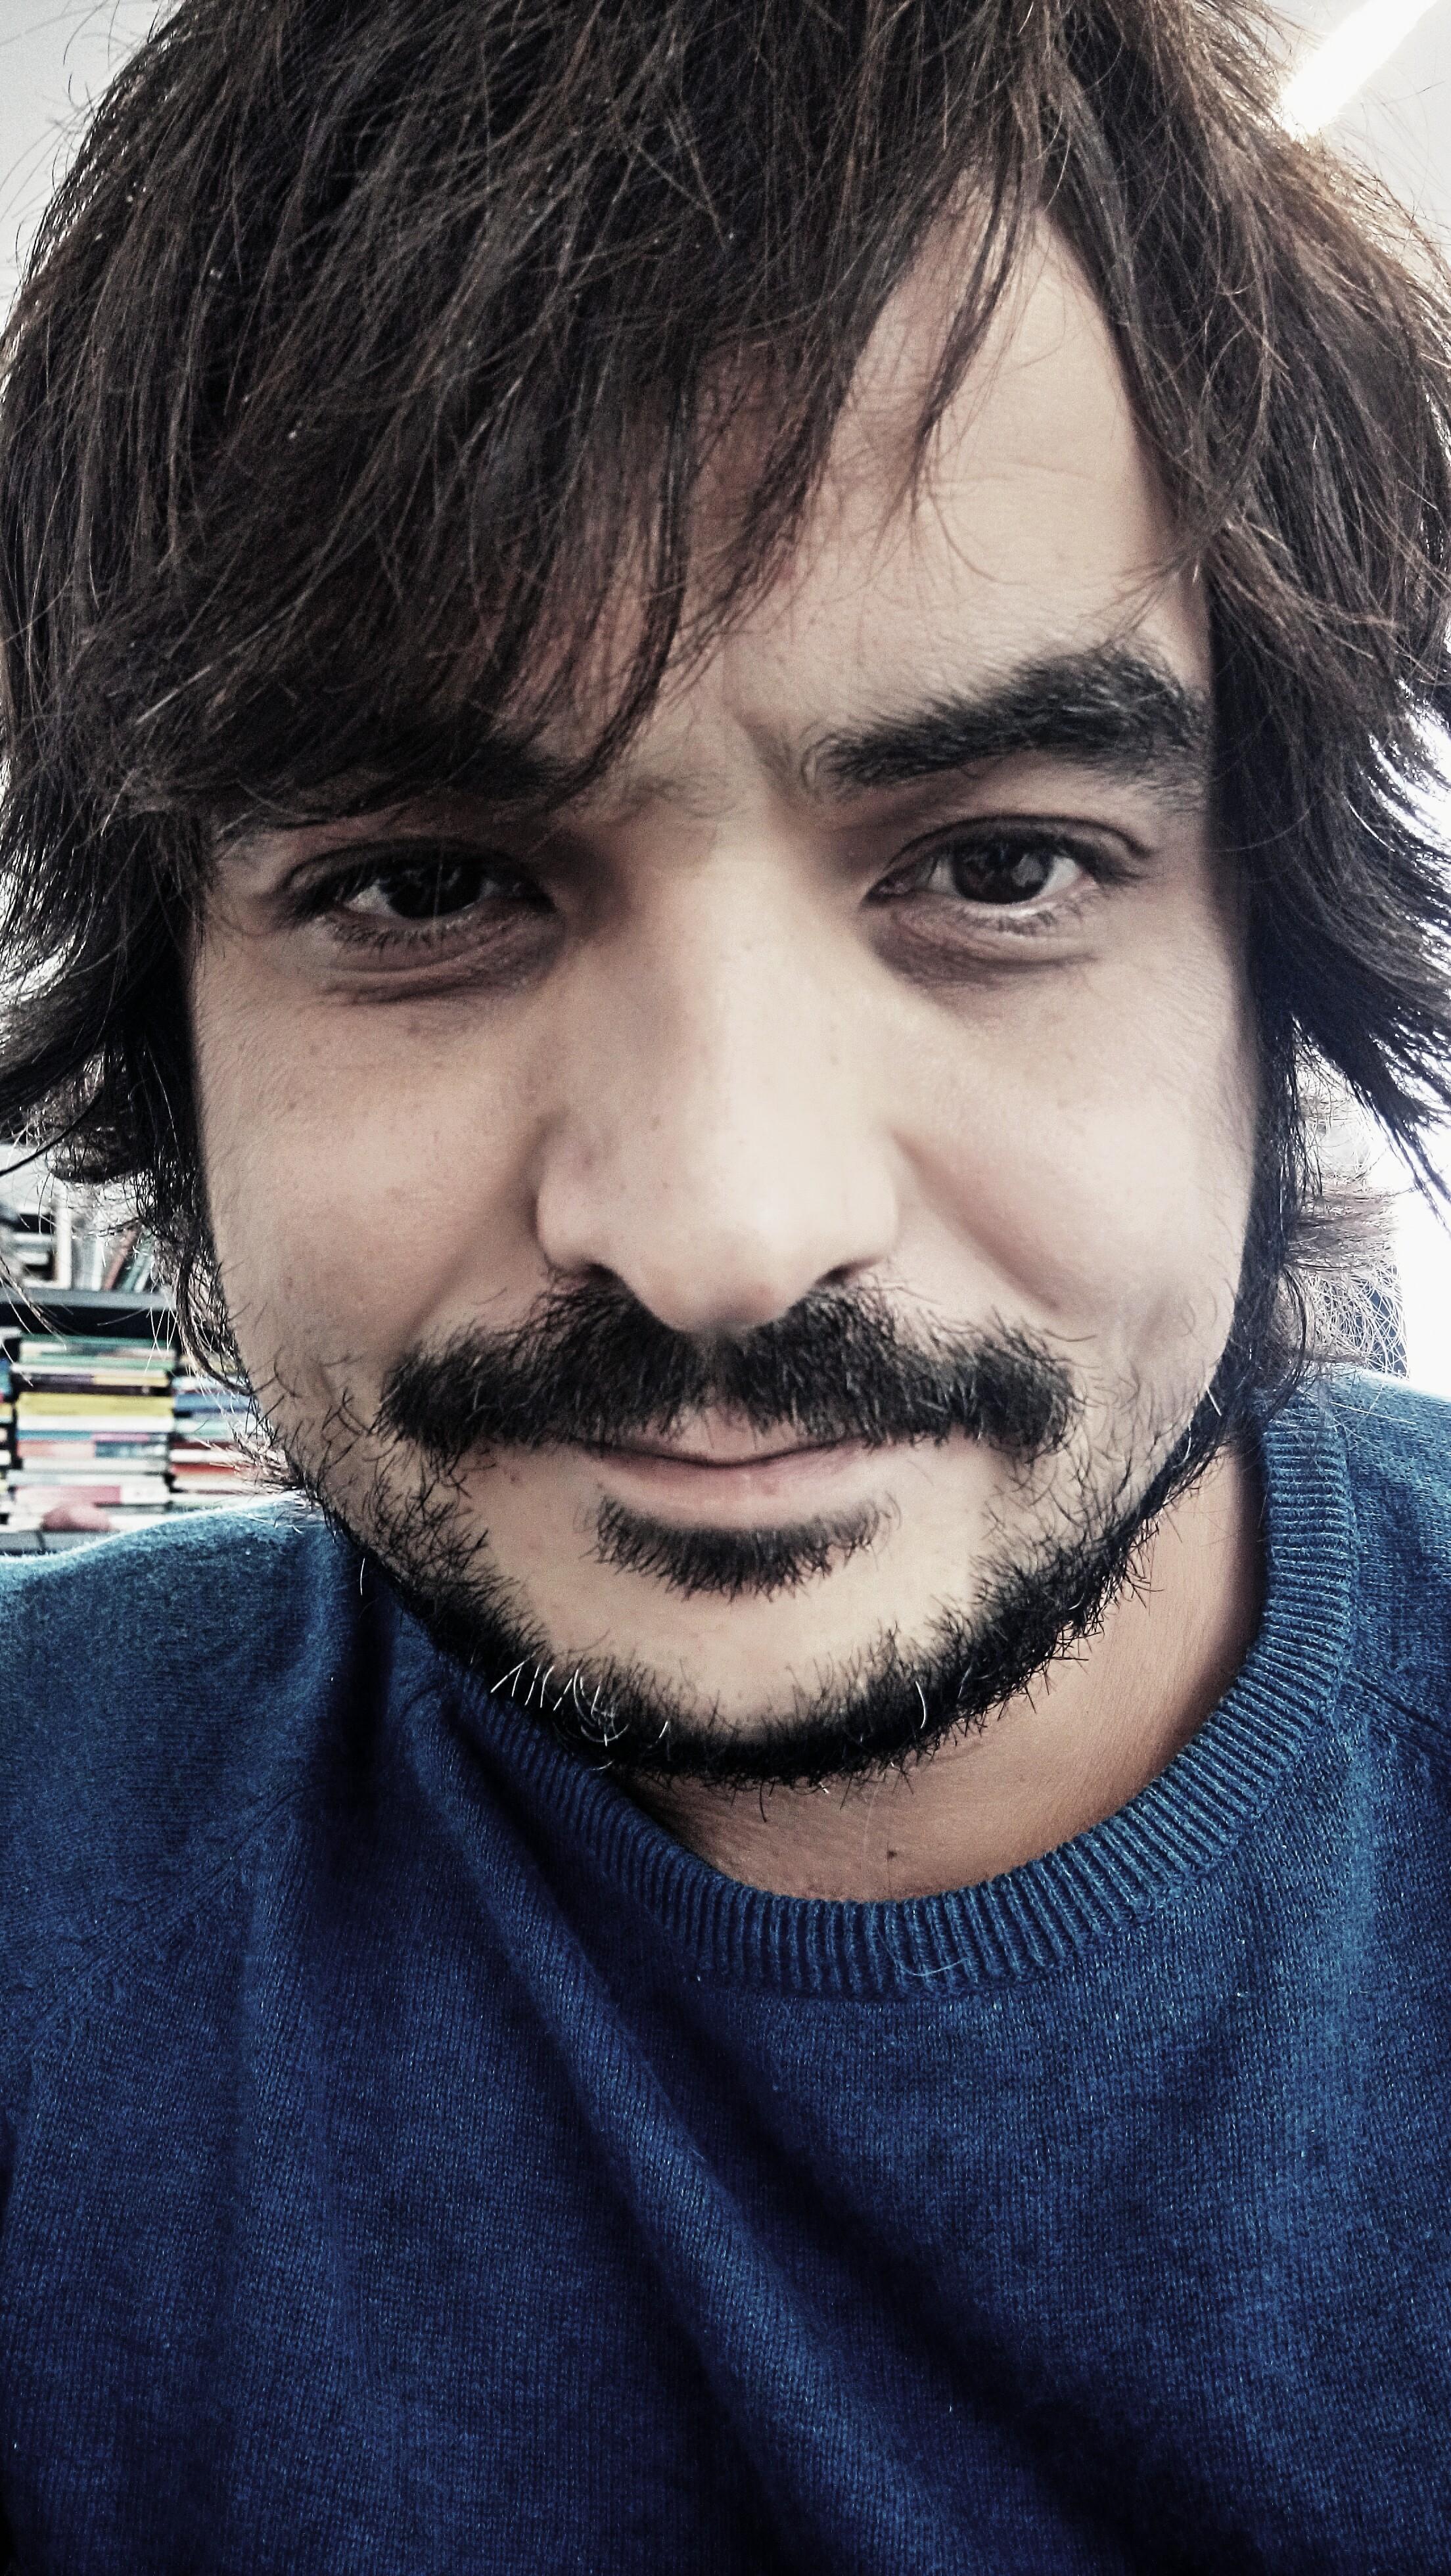 Spain -Catalonia: Antoniu Llort Arsu